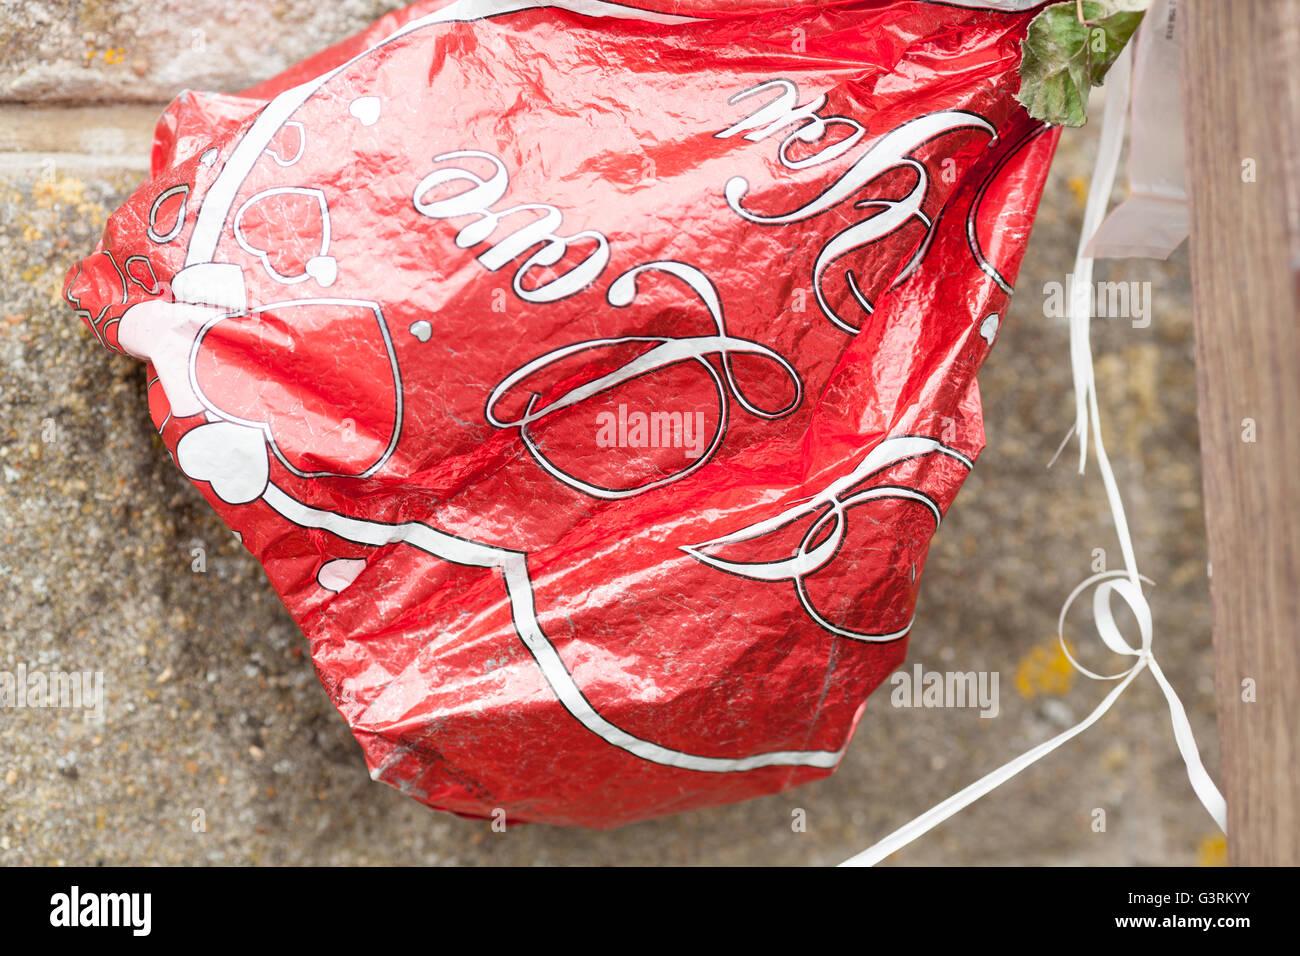 Deflated love heart balloon - Stock Image